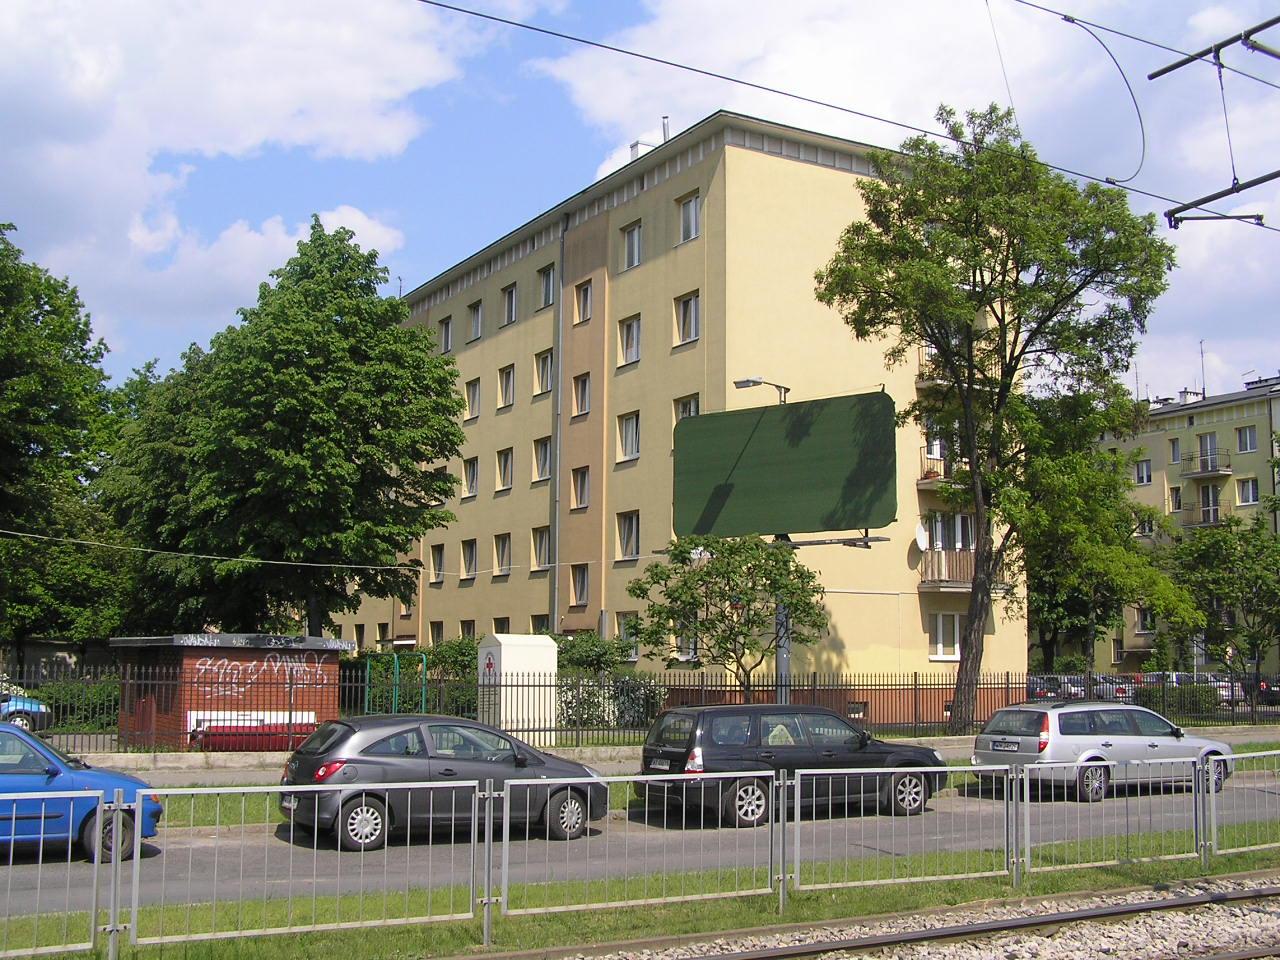 Grochowska 52